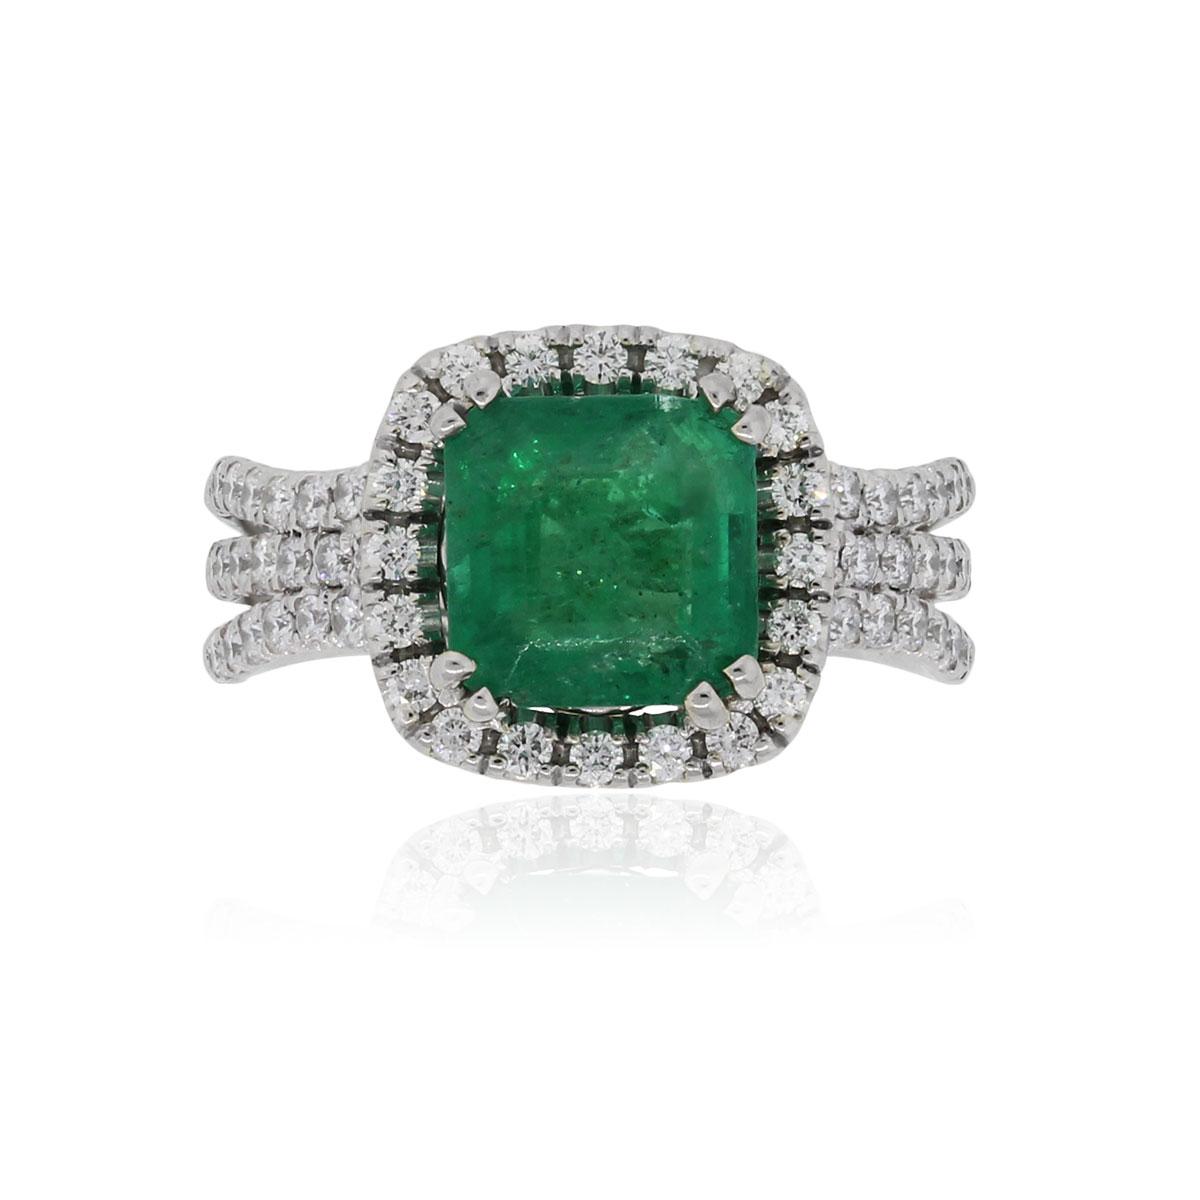 14k White Gold 2ct Cushion Cut Emerald and 0.85ctw Diamond Ring